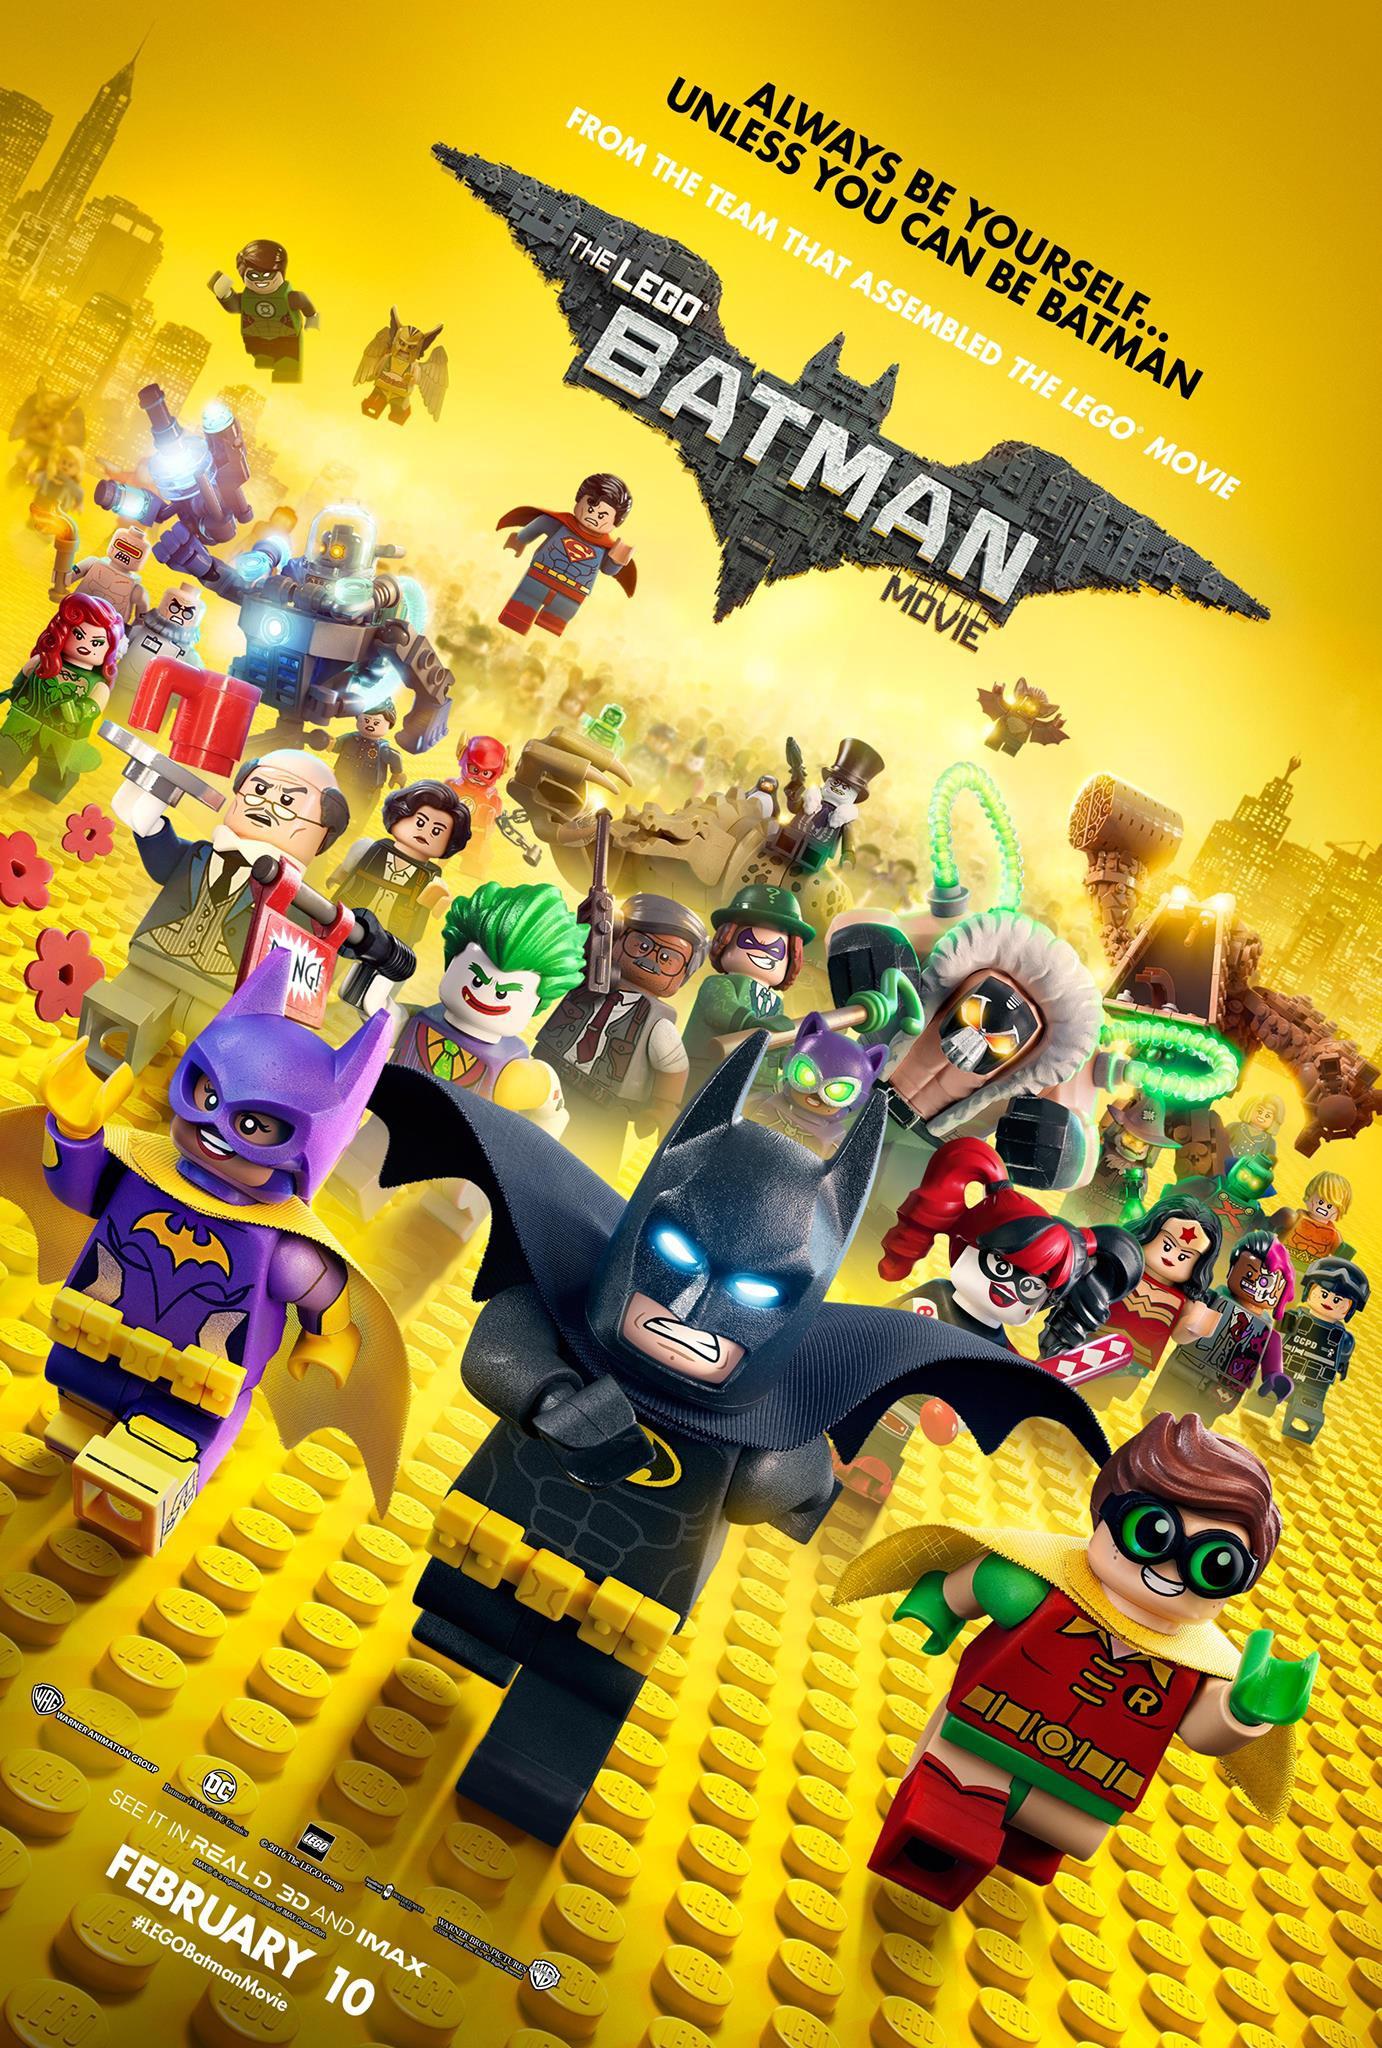 341-lego_batman_movie_ver4_xxlg.jpg